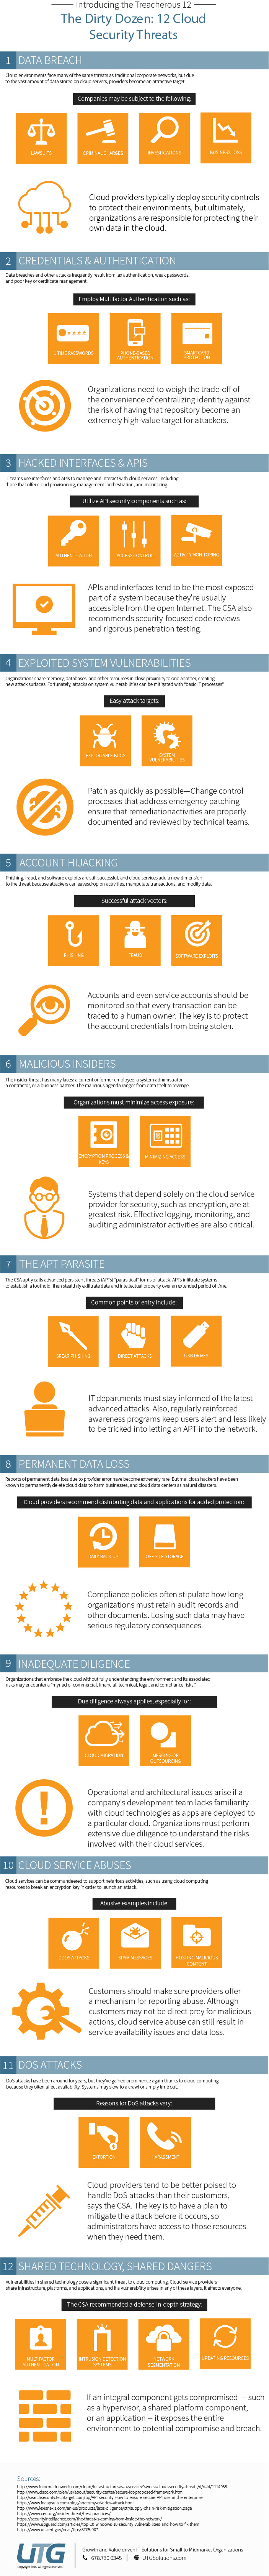 12 cloud security threats